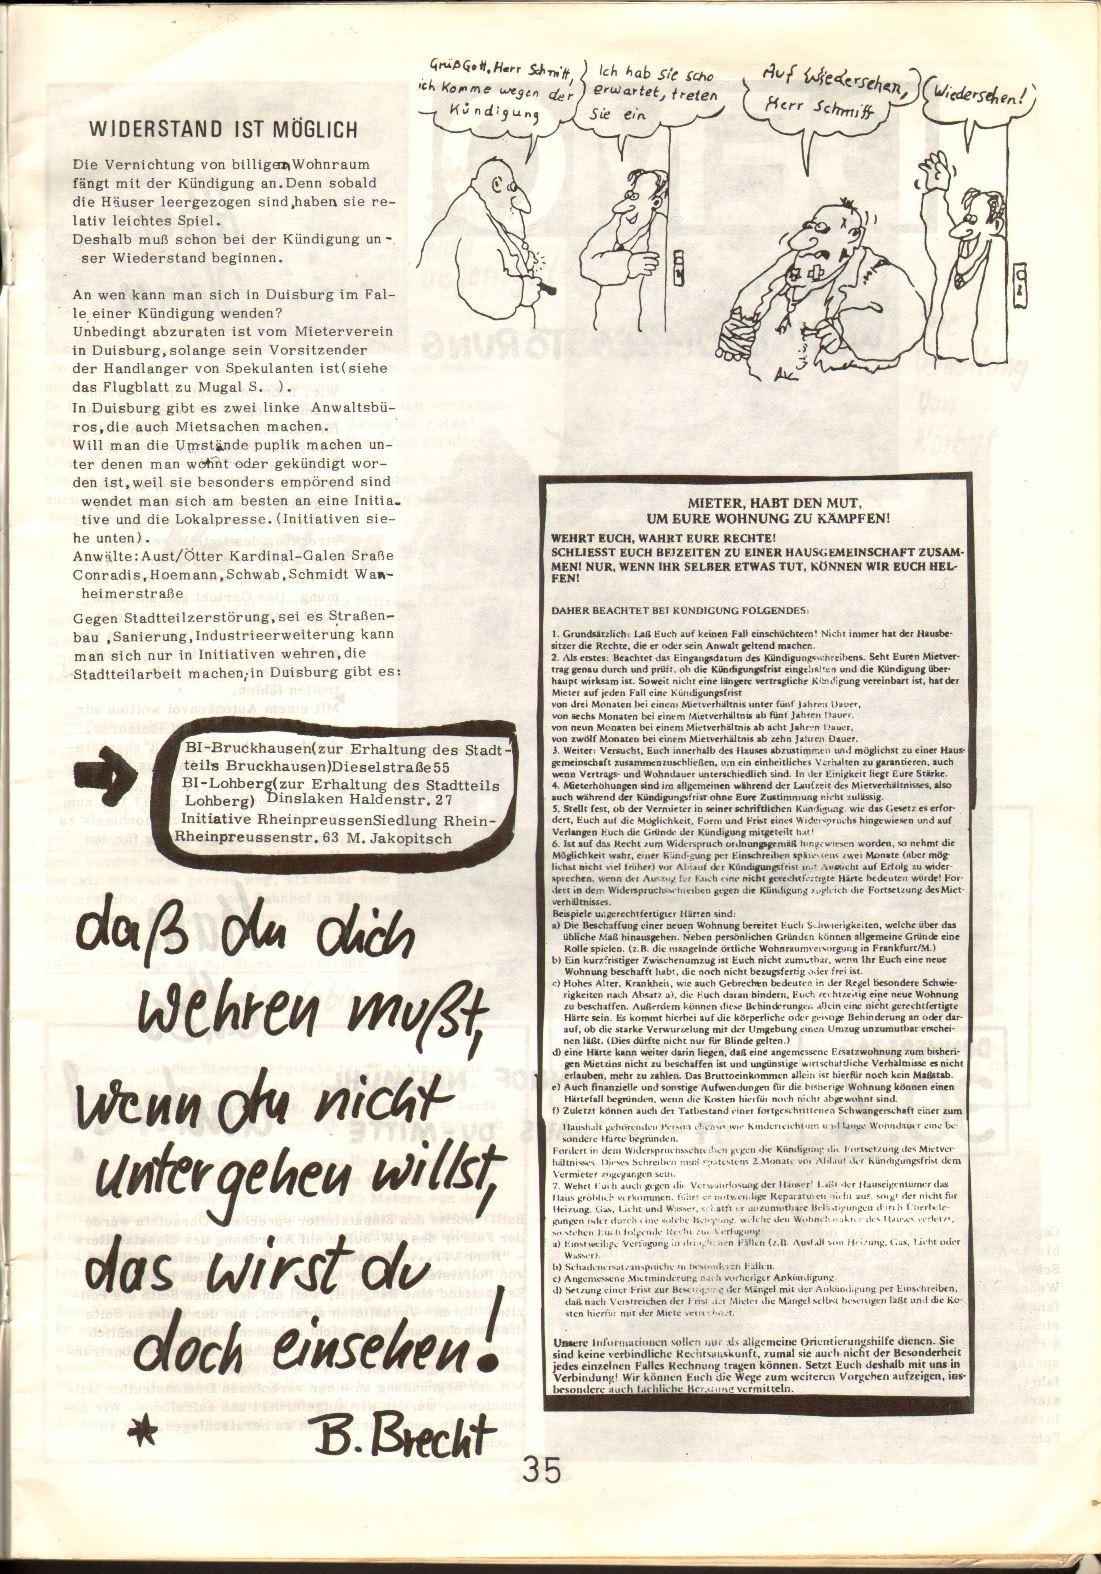 Duisburg_1981_Doku_Neumuehler_Bahnhof_35